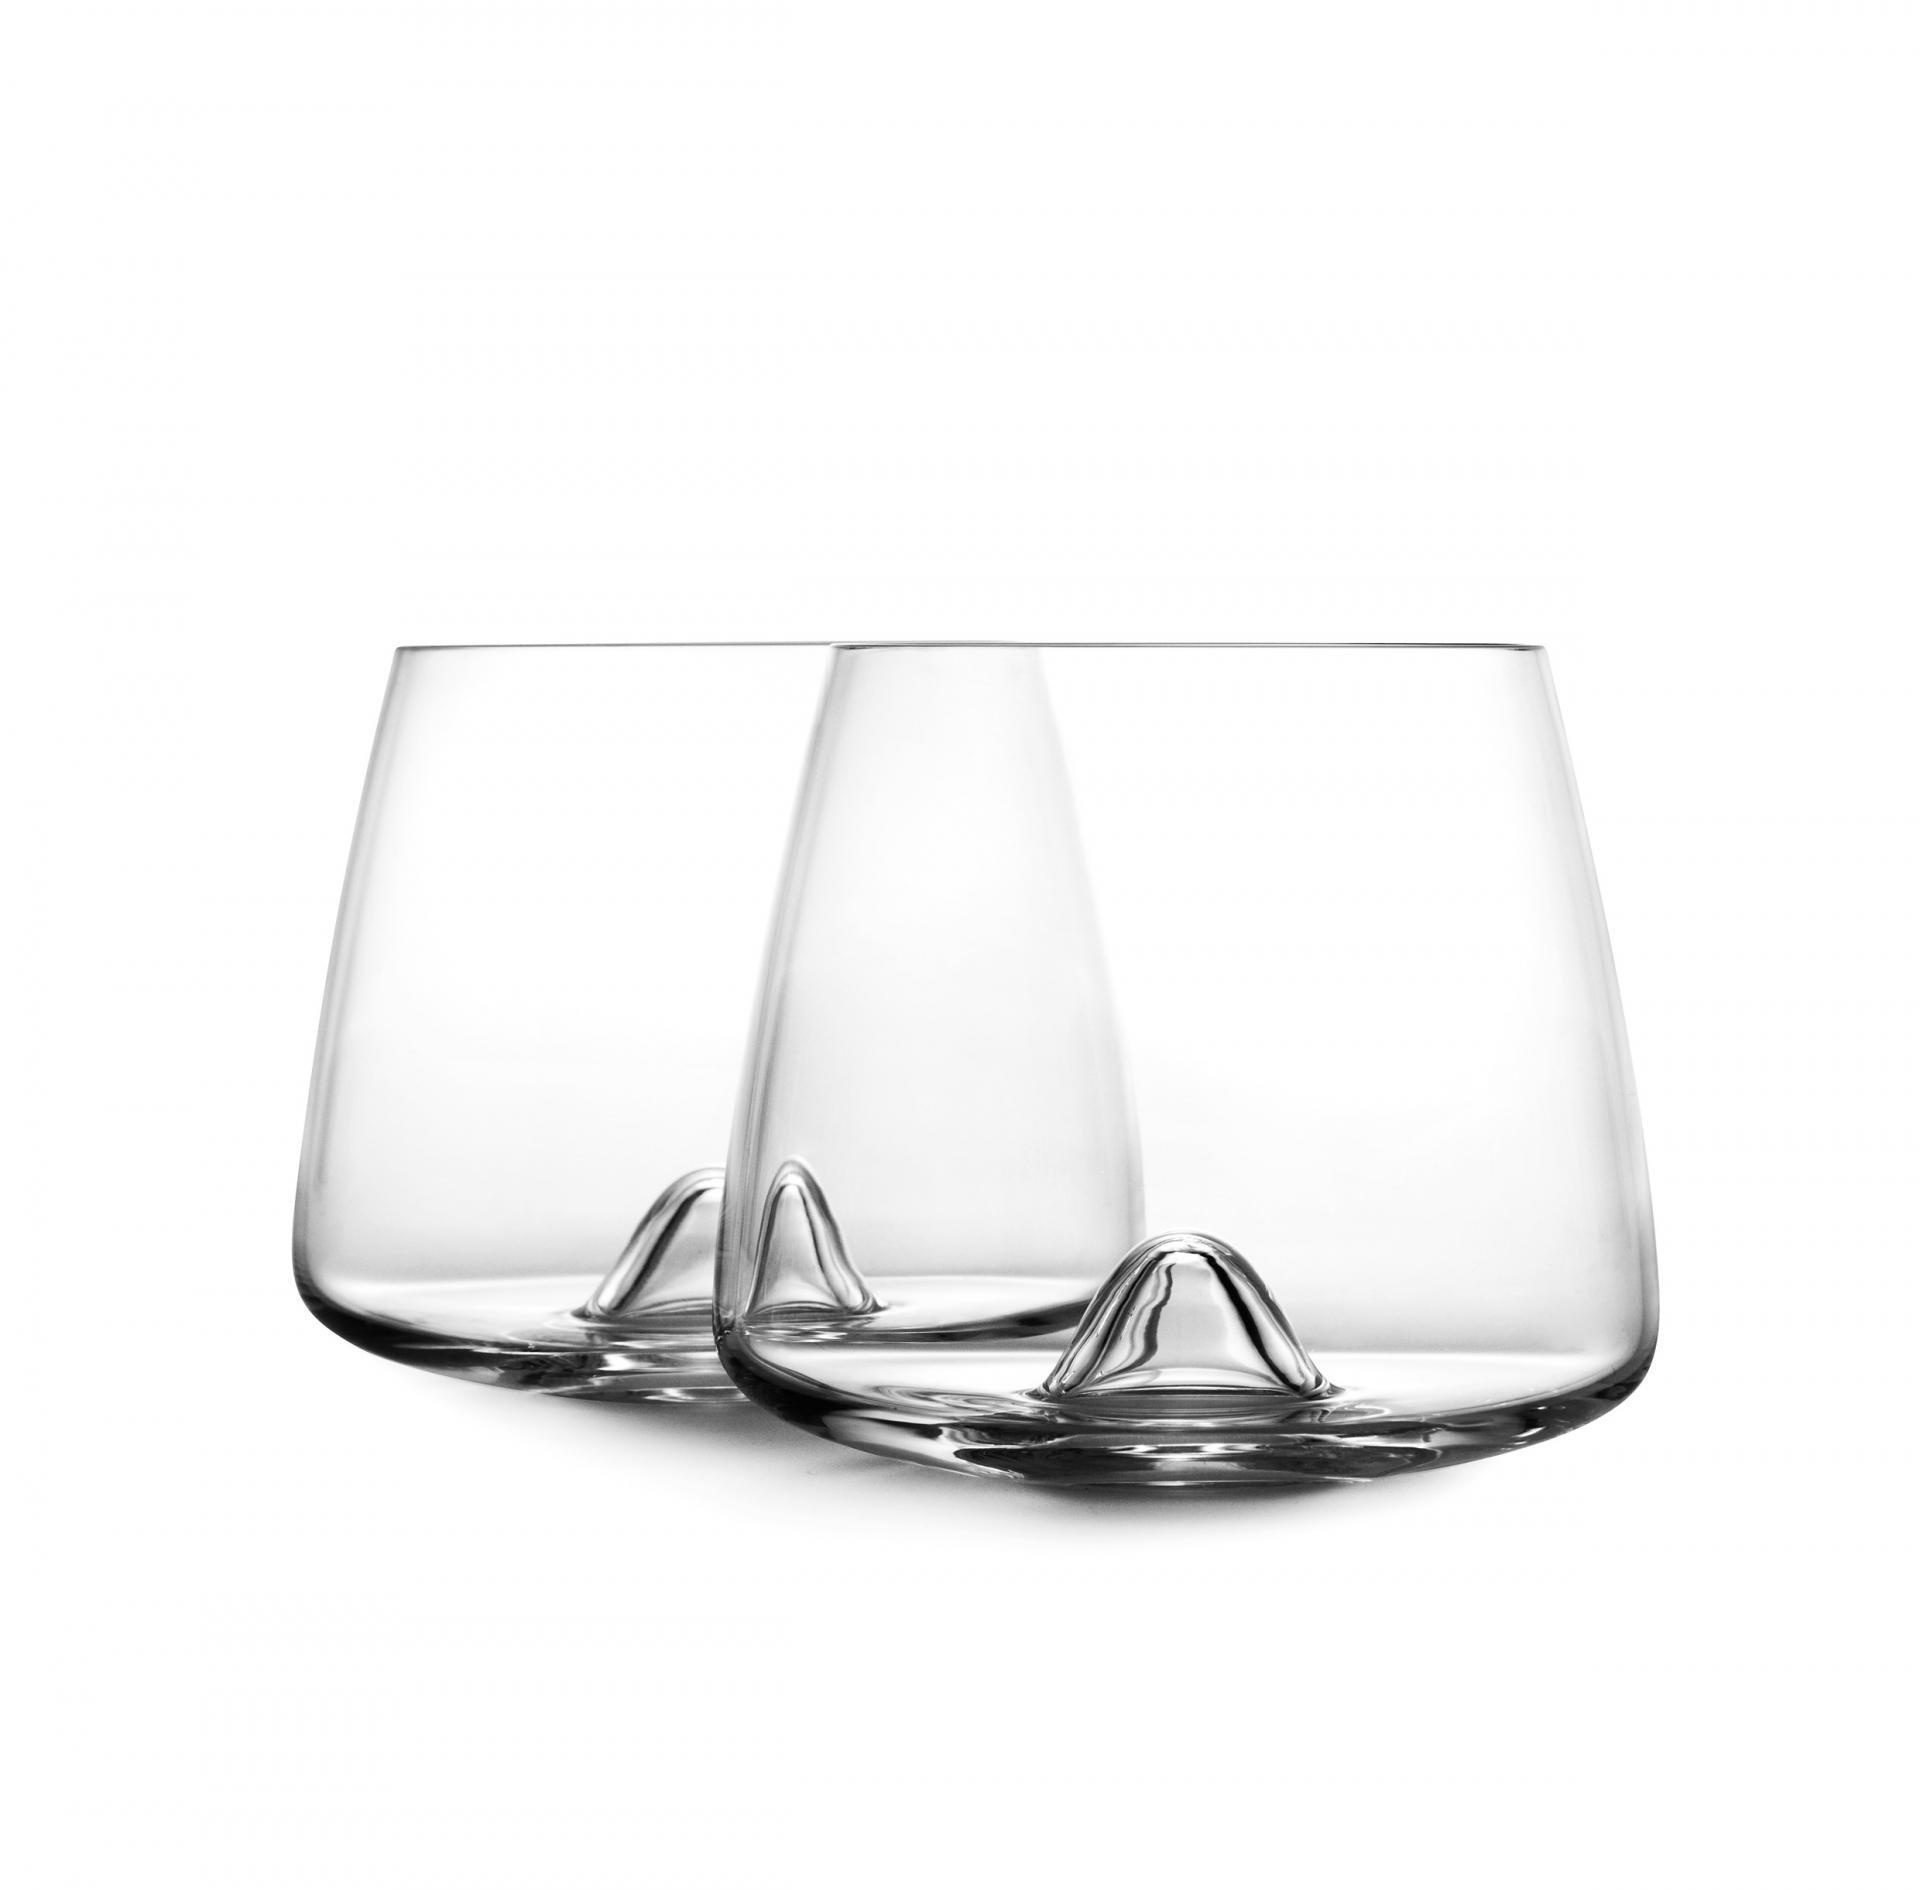 normann COPENHAGEN Skleničky na whisky Normann Copenhagen - set 2 ks, čirá barva, sklo